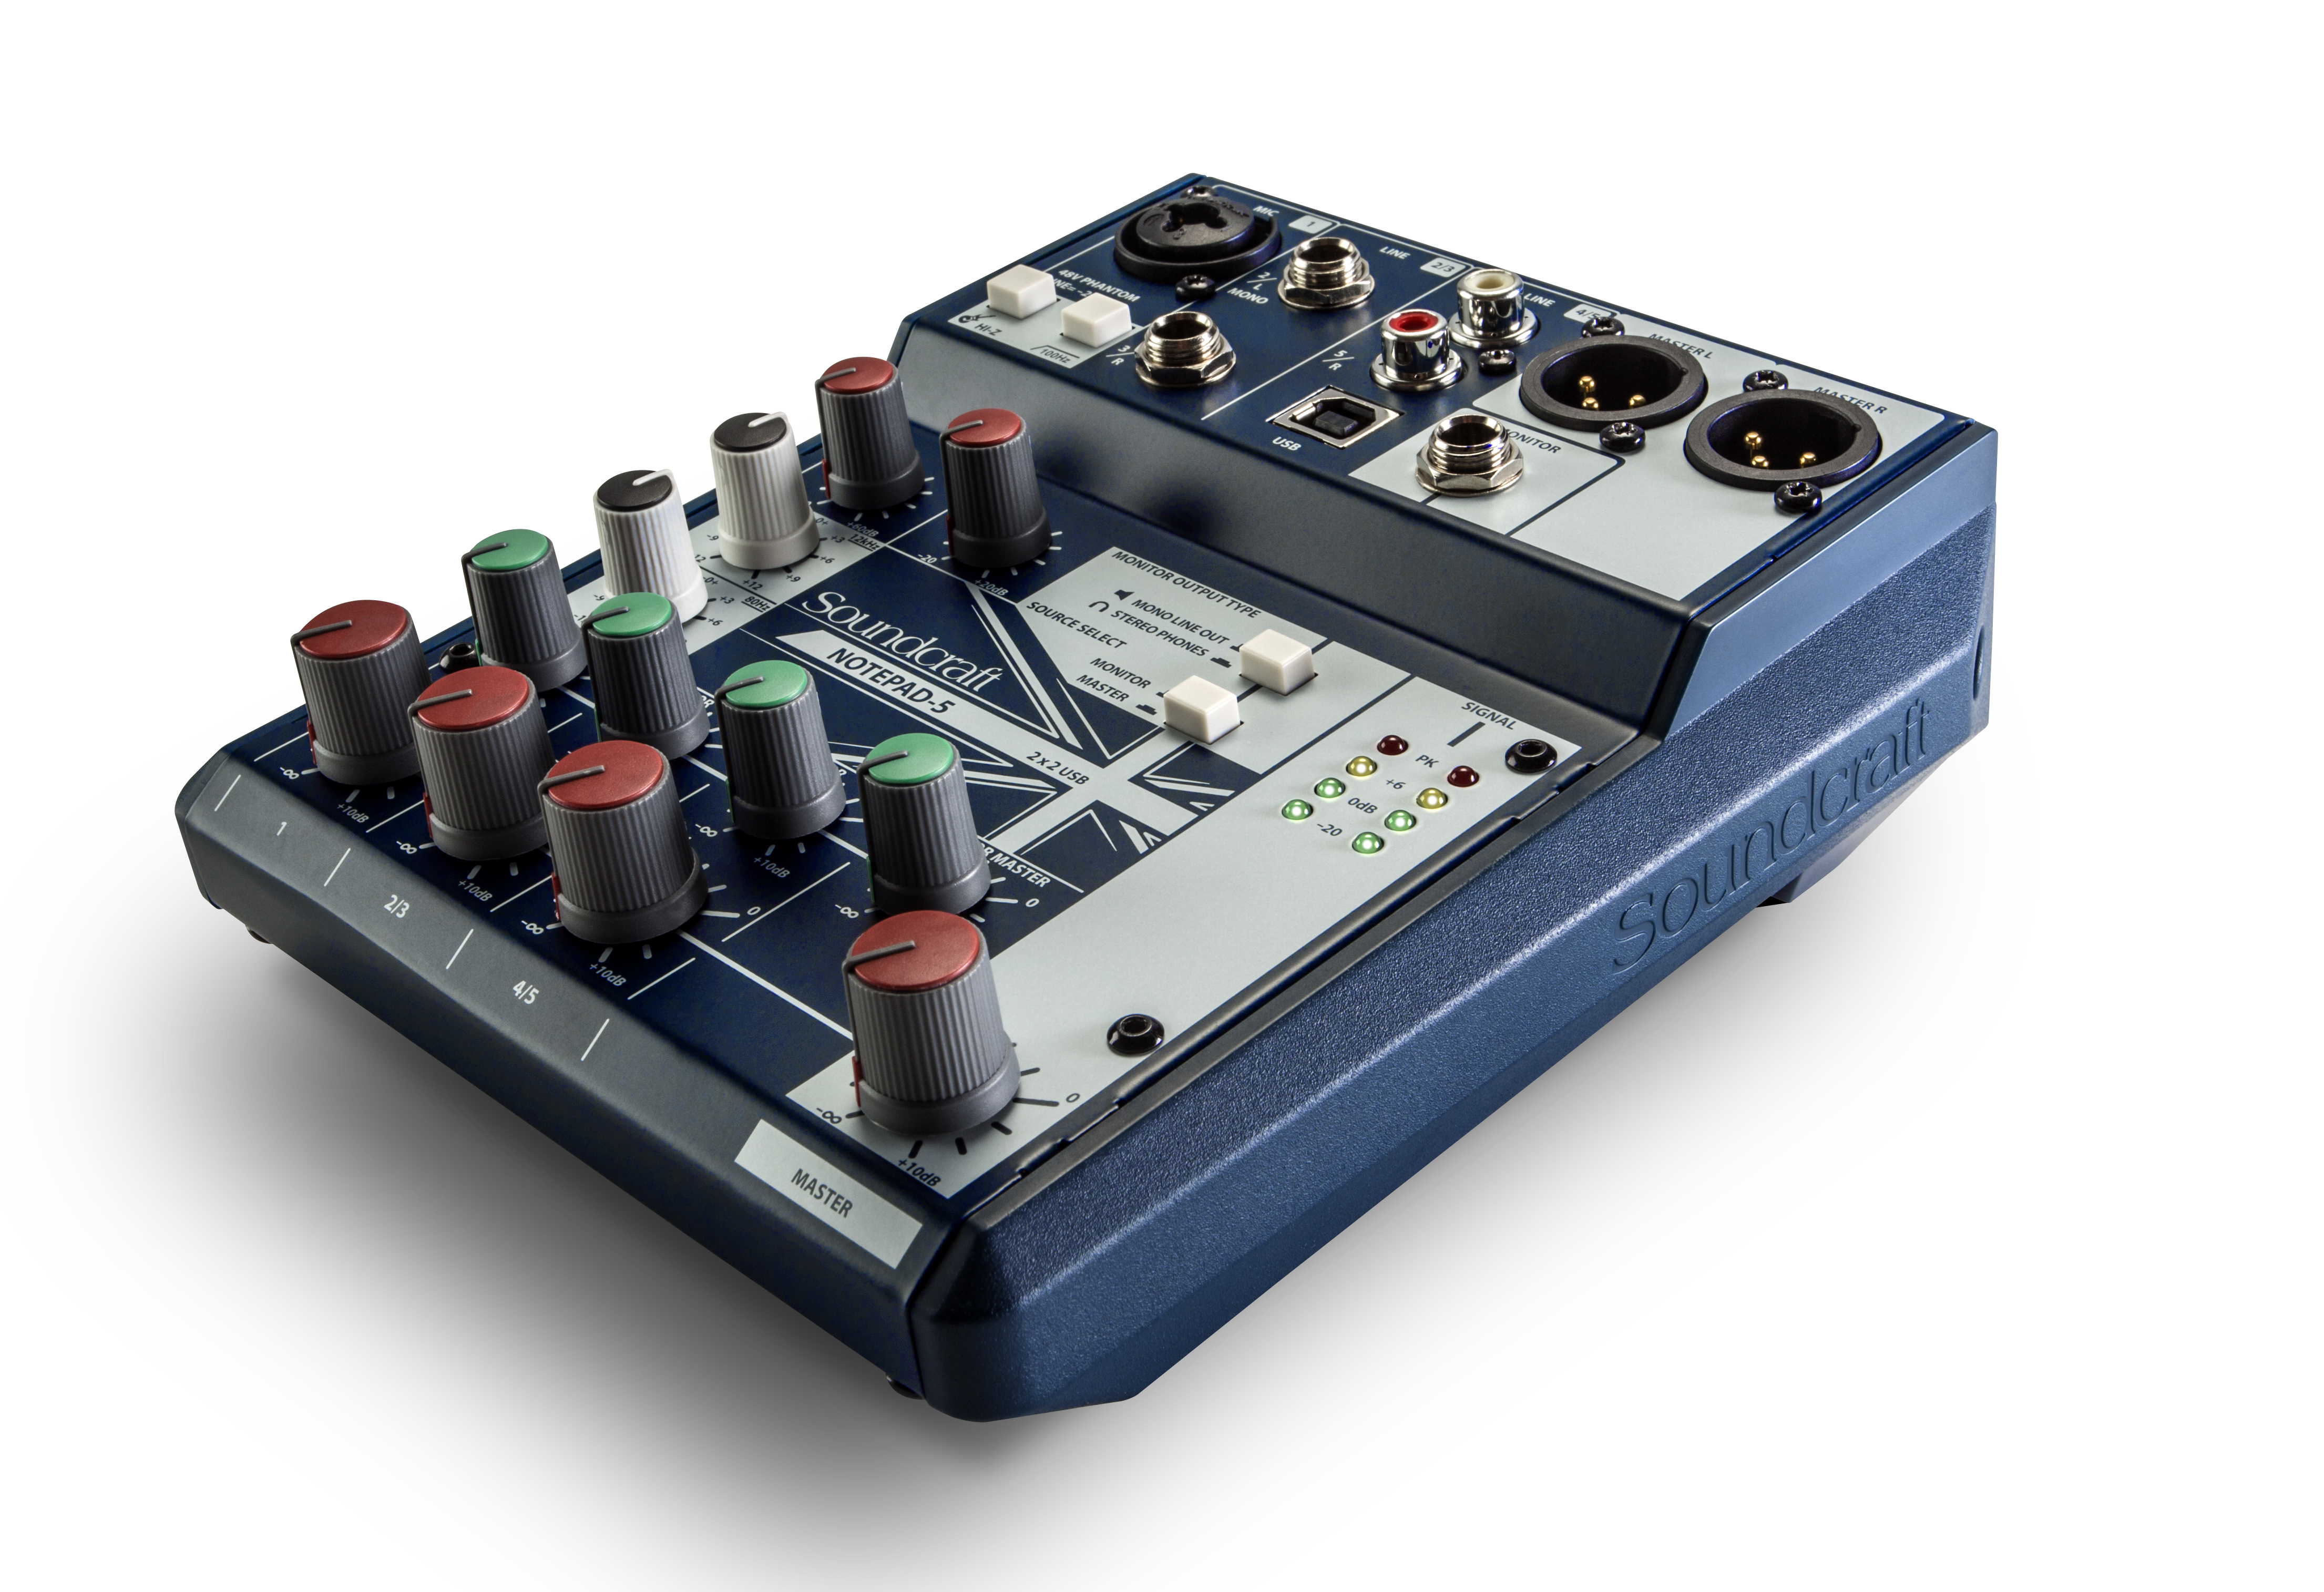 notepad 5 soundcraft professional audio mixersMini Stereo Mixer Mic Line For Pc Audio Card #20